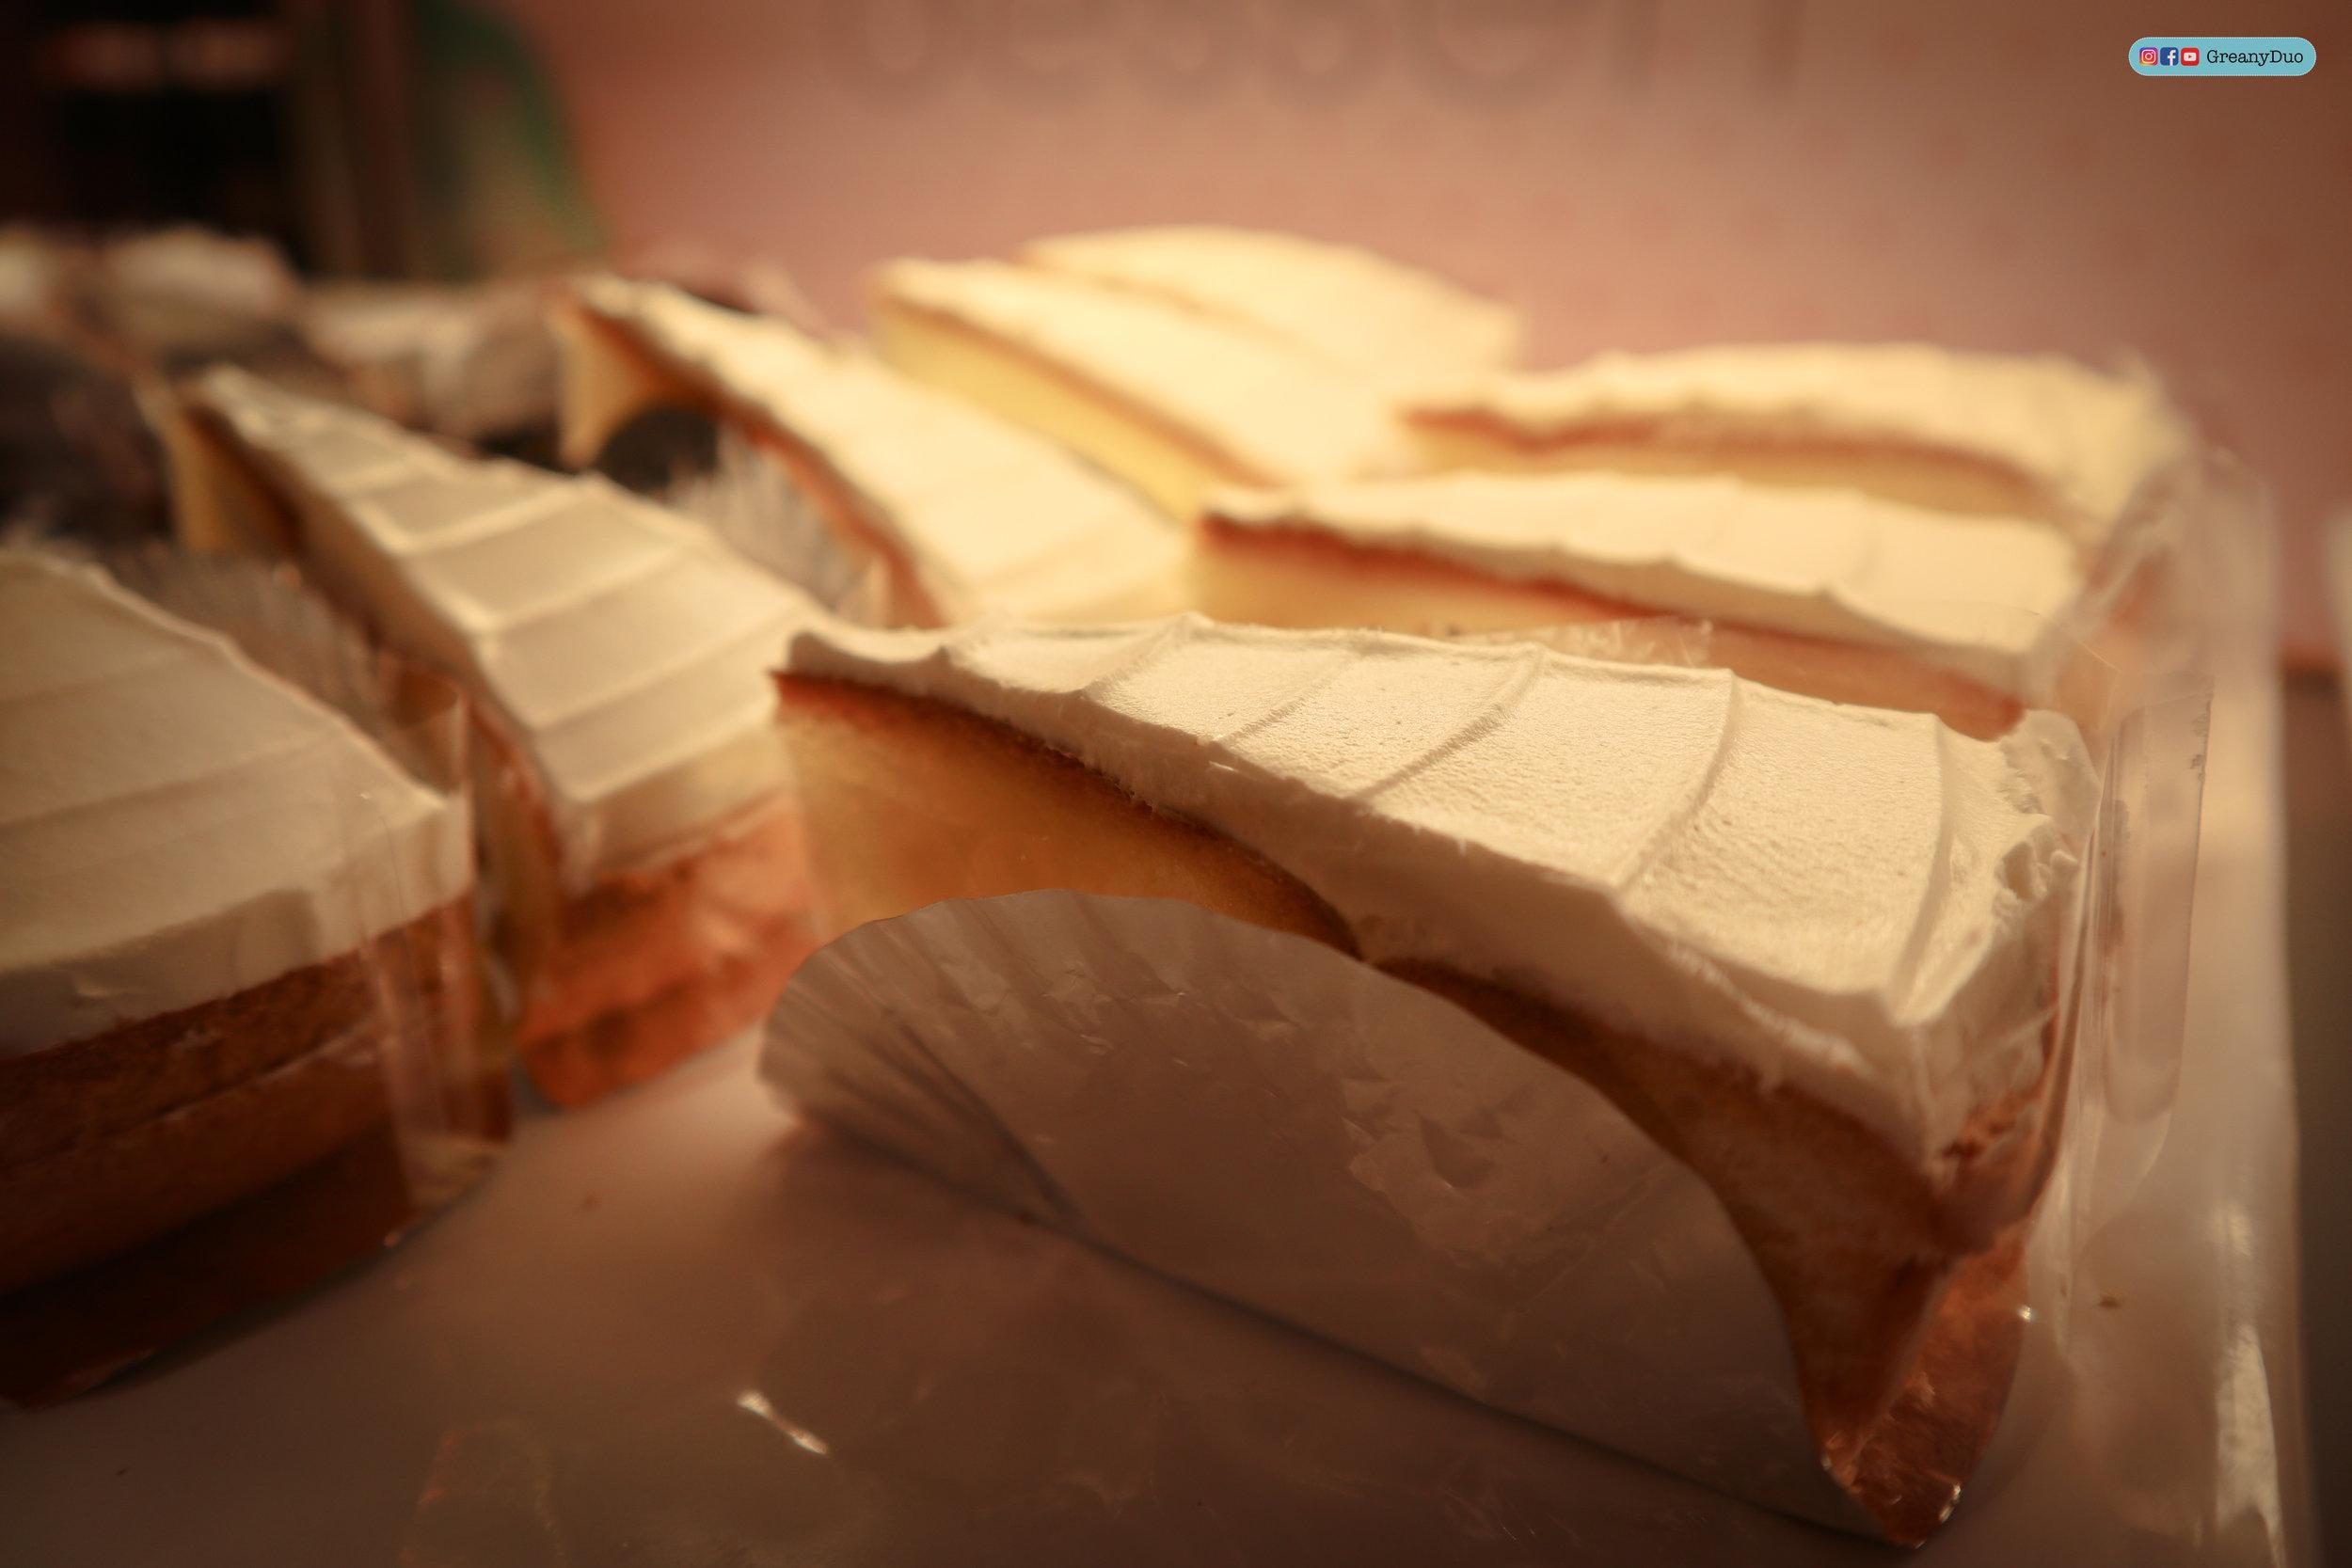 cake at บุฟเฟ่ต์ชาบูไต้หวันที่ Hakkai Shabu Shabu ซีเหมินติง